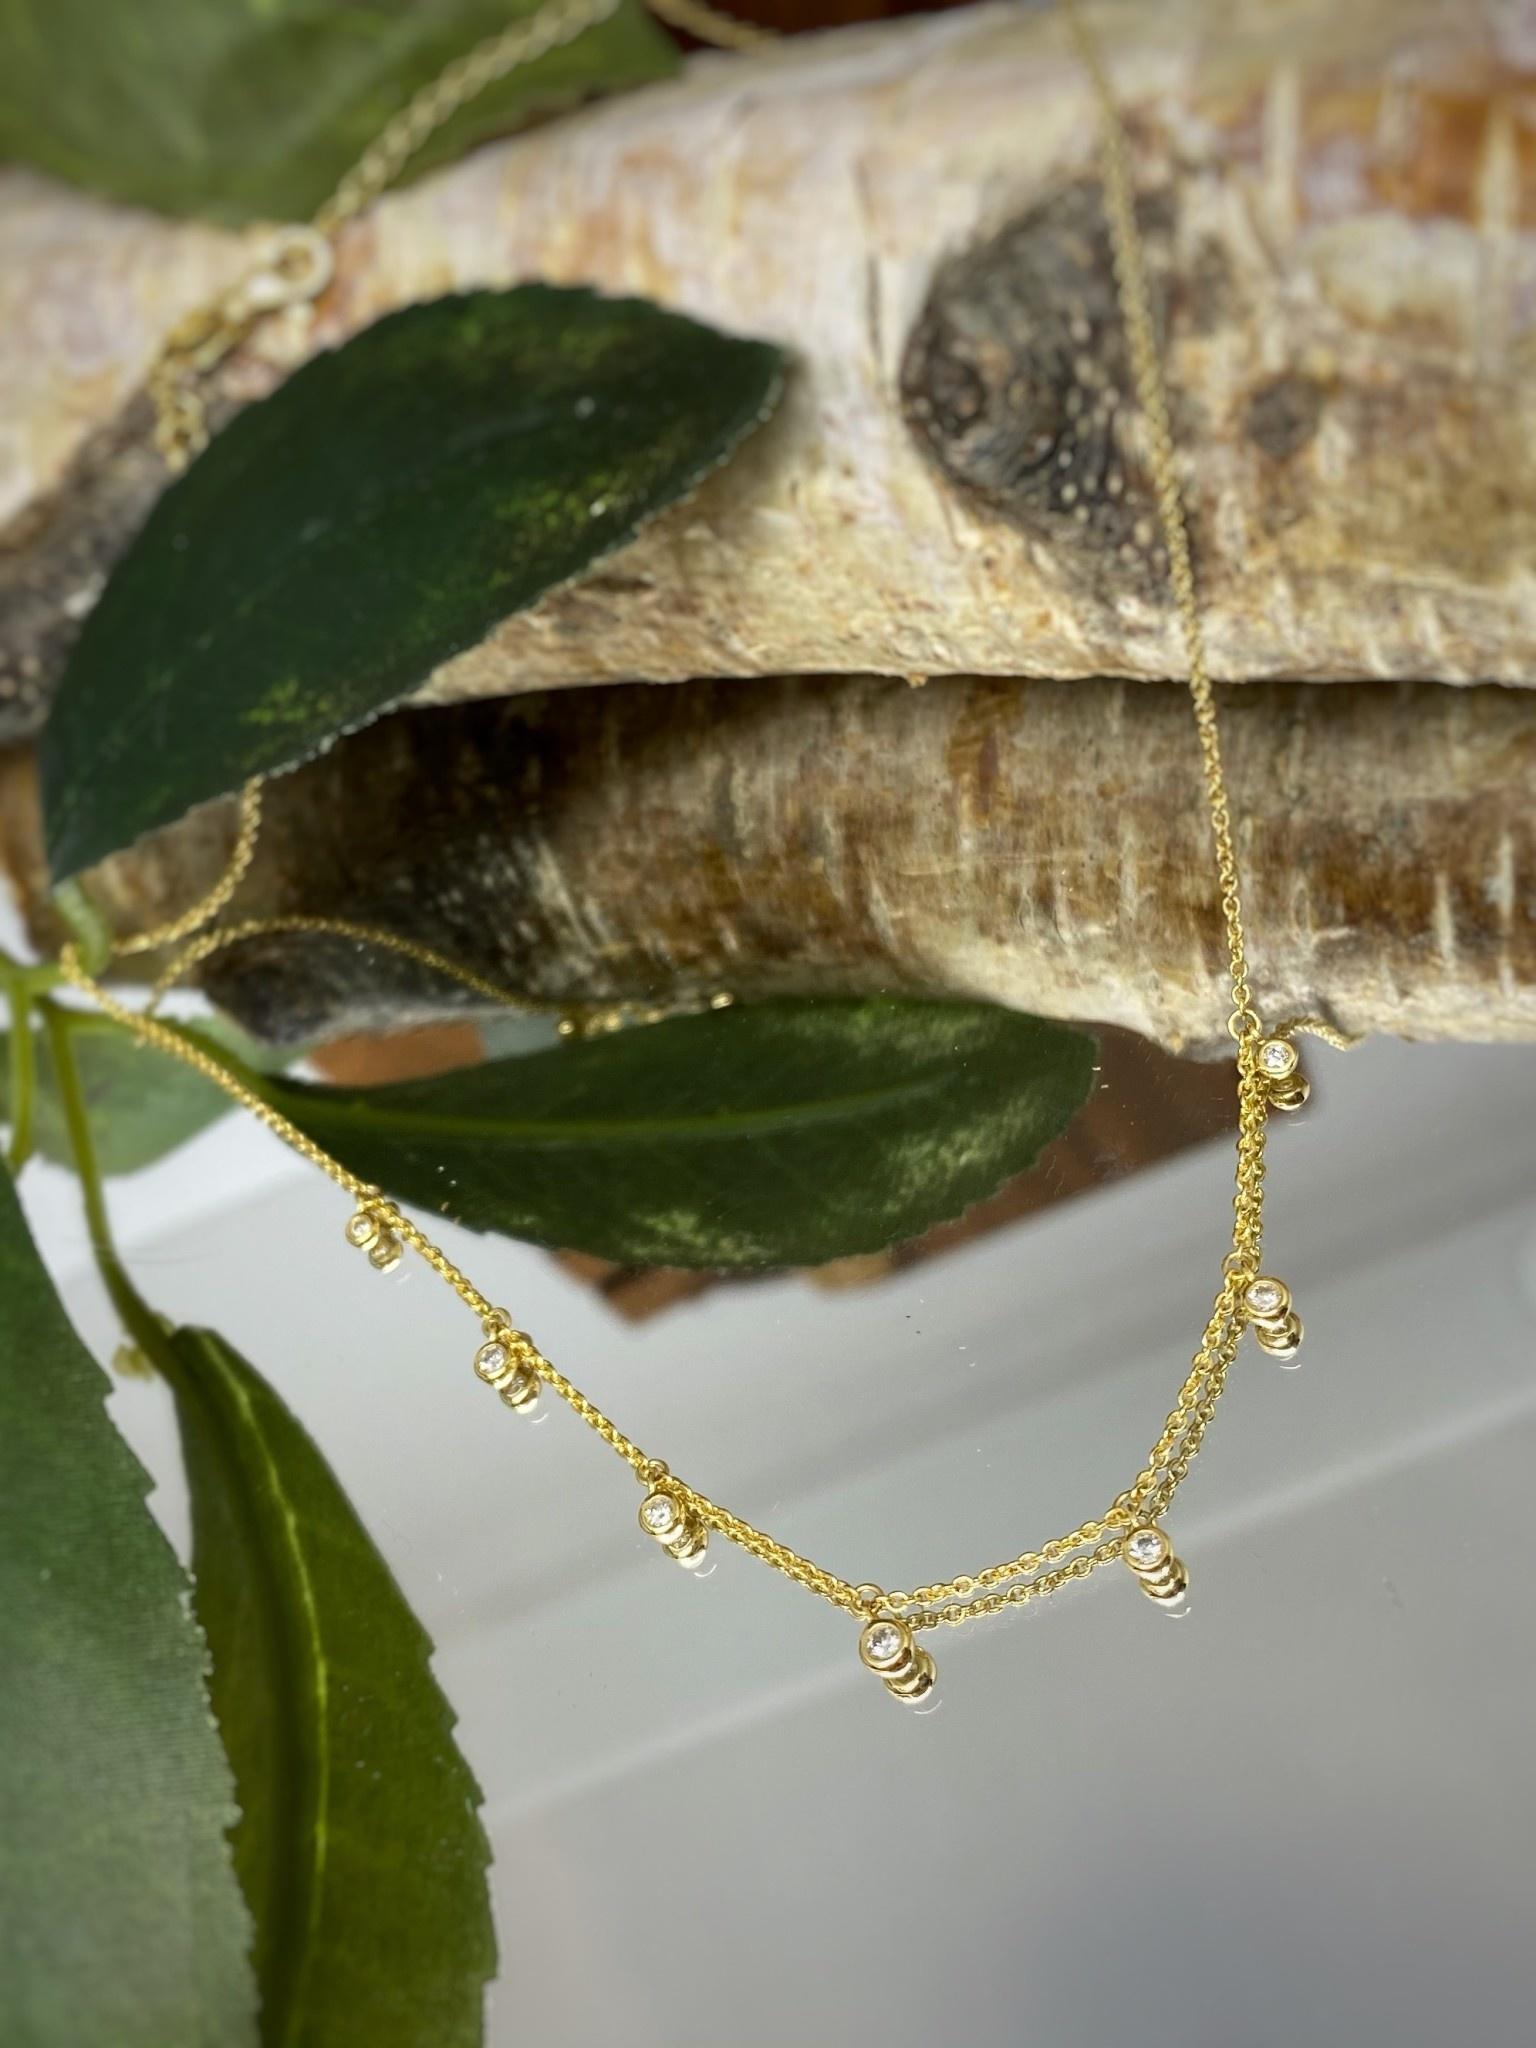 10K Yellow Gold Bezel Set Diamond Choker Necklace